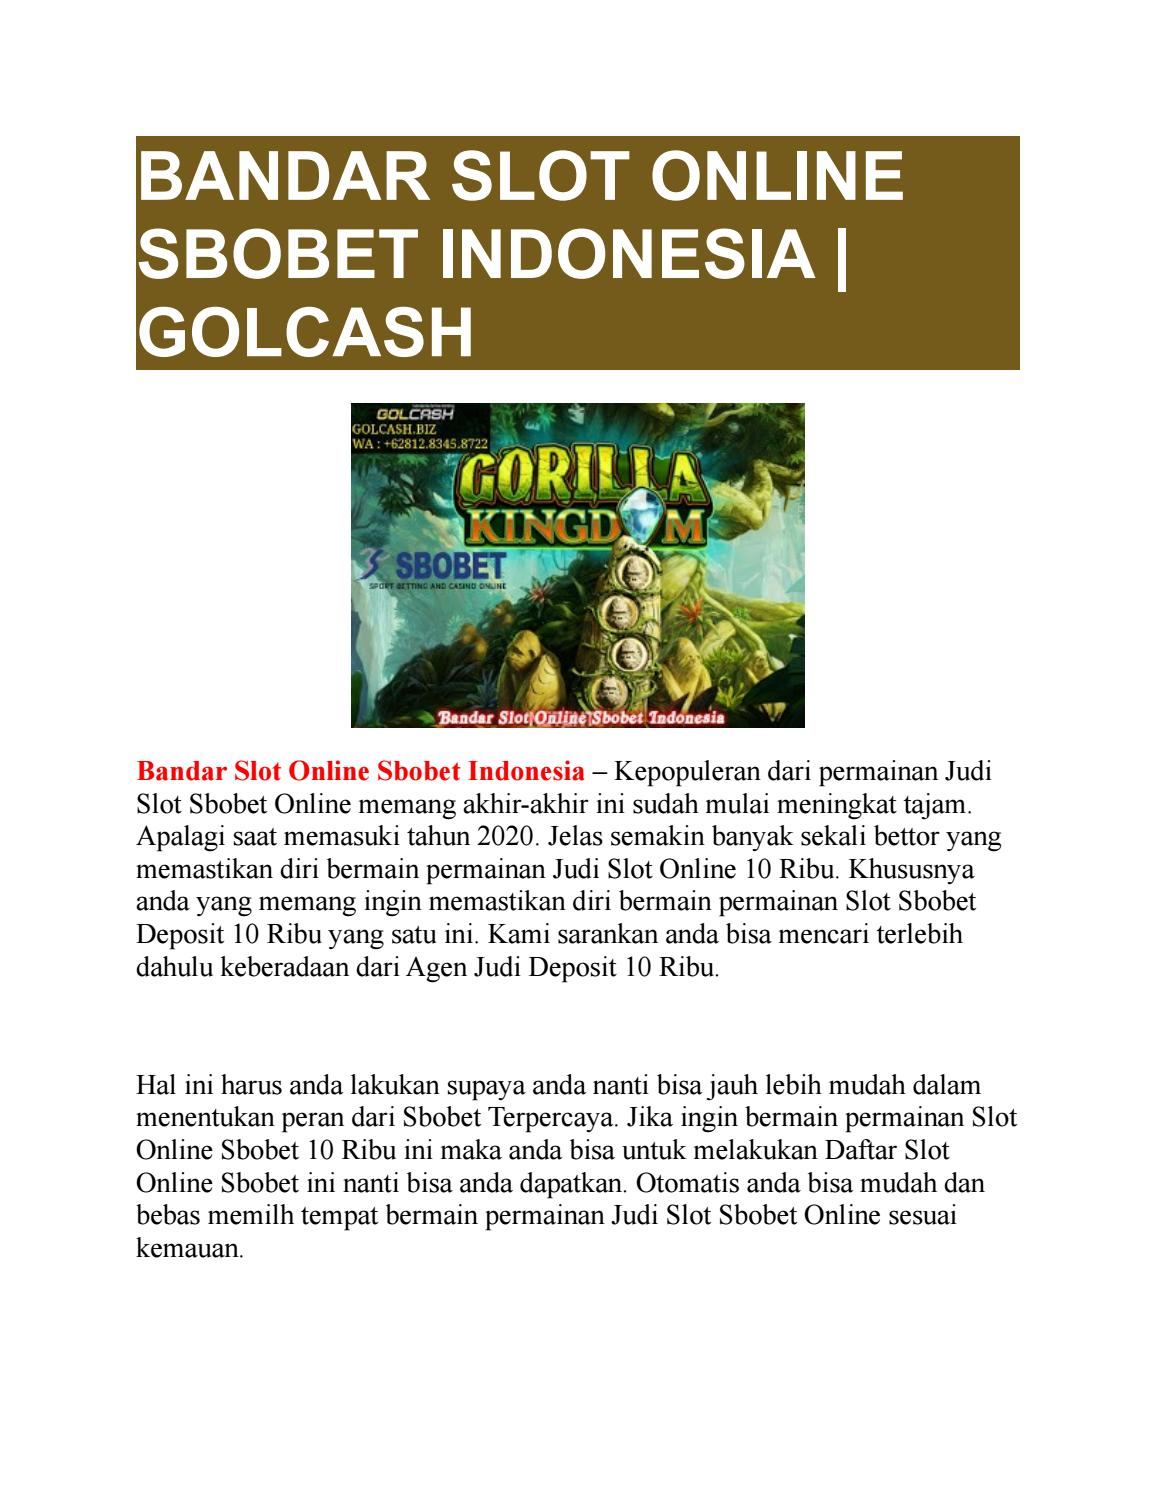 Bandar Slot Online Sbobet Indonesia Golcash By Golcash Issuu